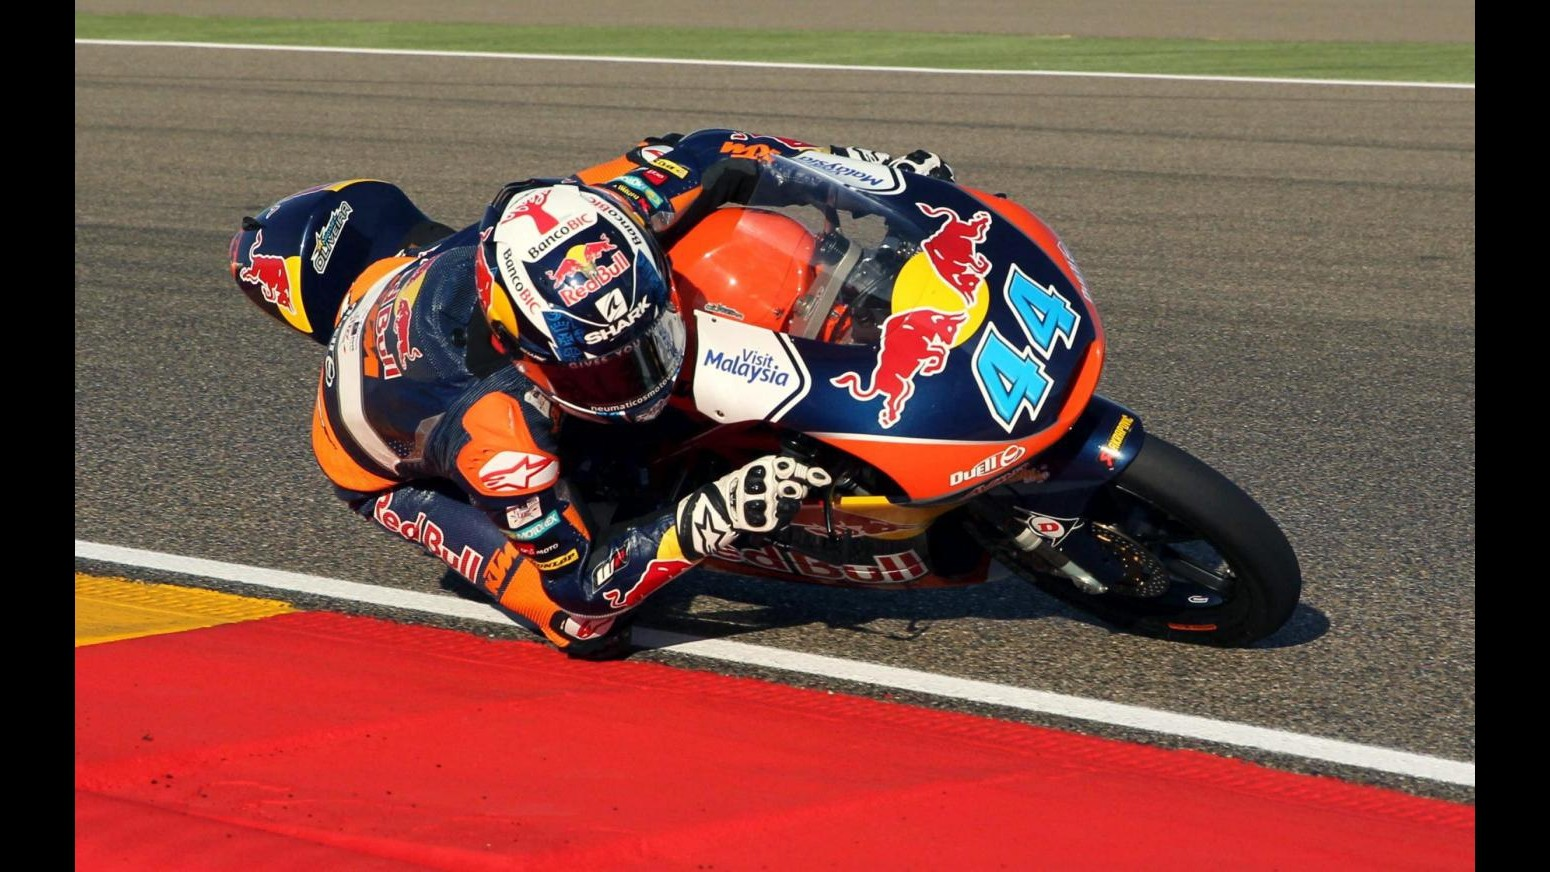 Motomondiale, Gp Aragon: Oliveira trionfa in Moto3, terzo Fenati